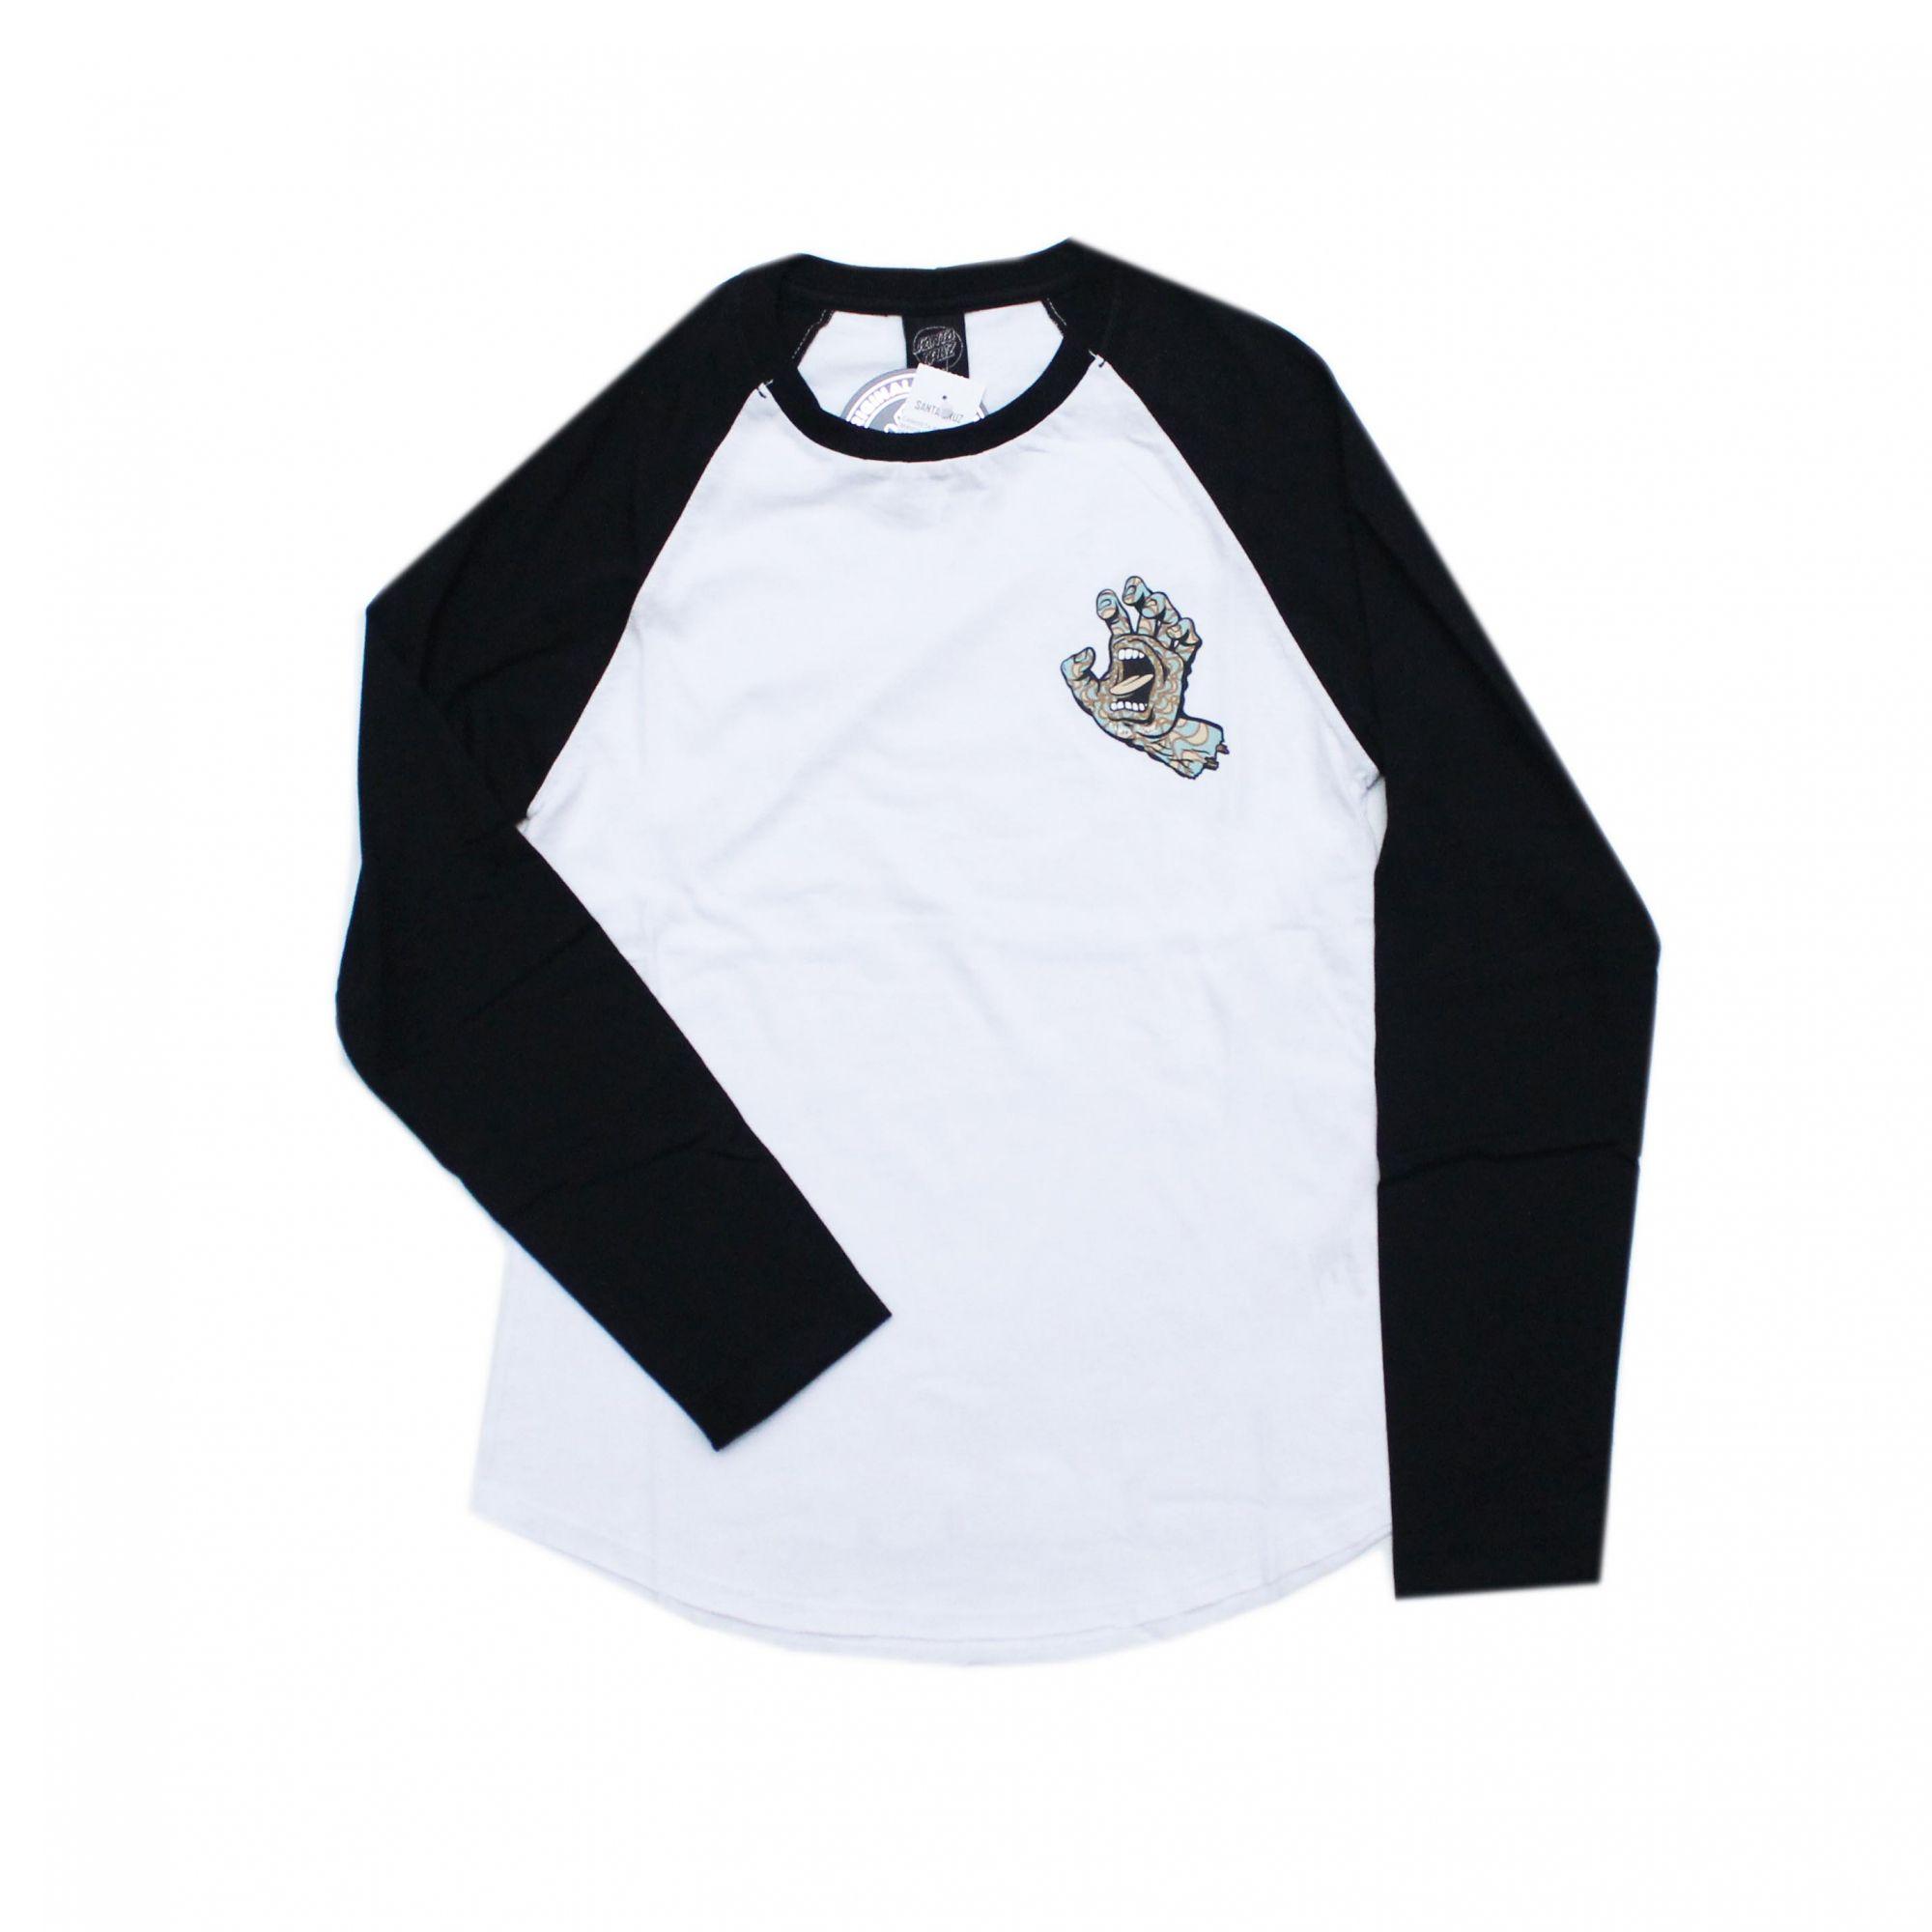 Camiseta Manga Longa Feminina Santa Cruz Raglan Kaleidohand Baseball - Branco